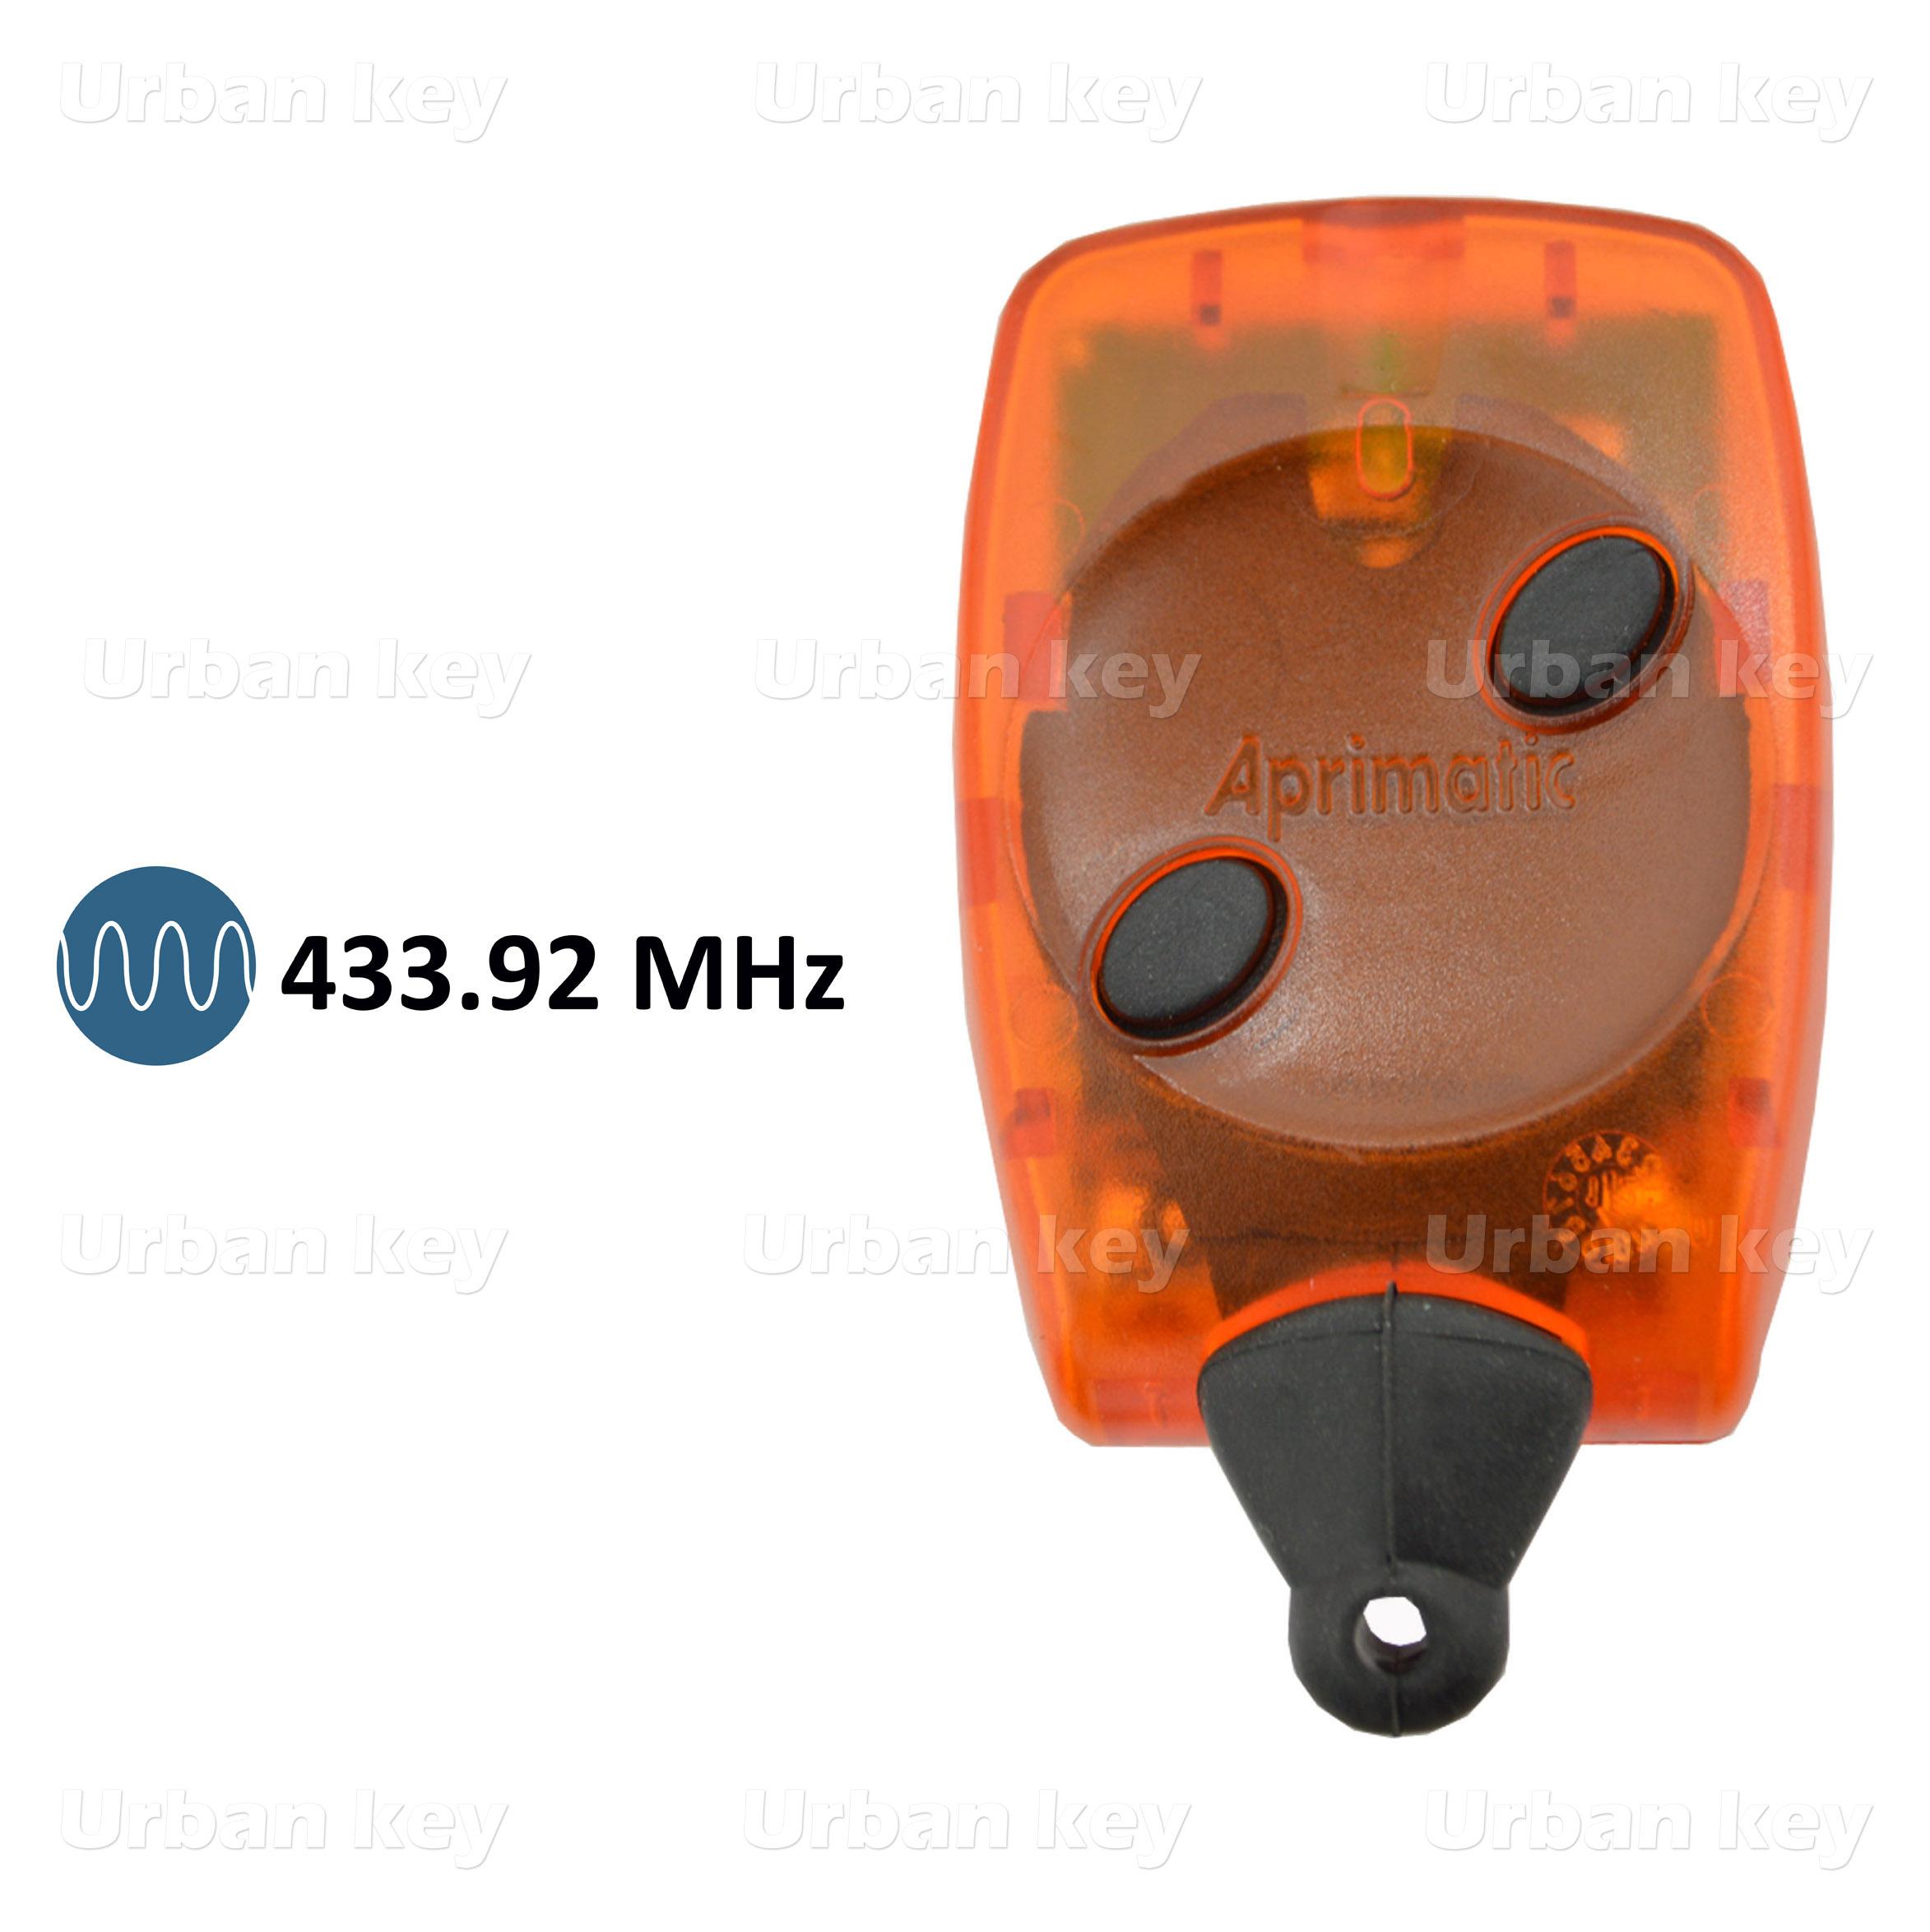 EMISSOR APRIMATIC TR2 BICANAL 433Mhz